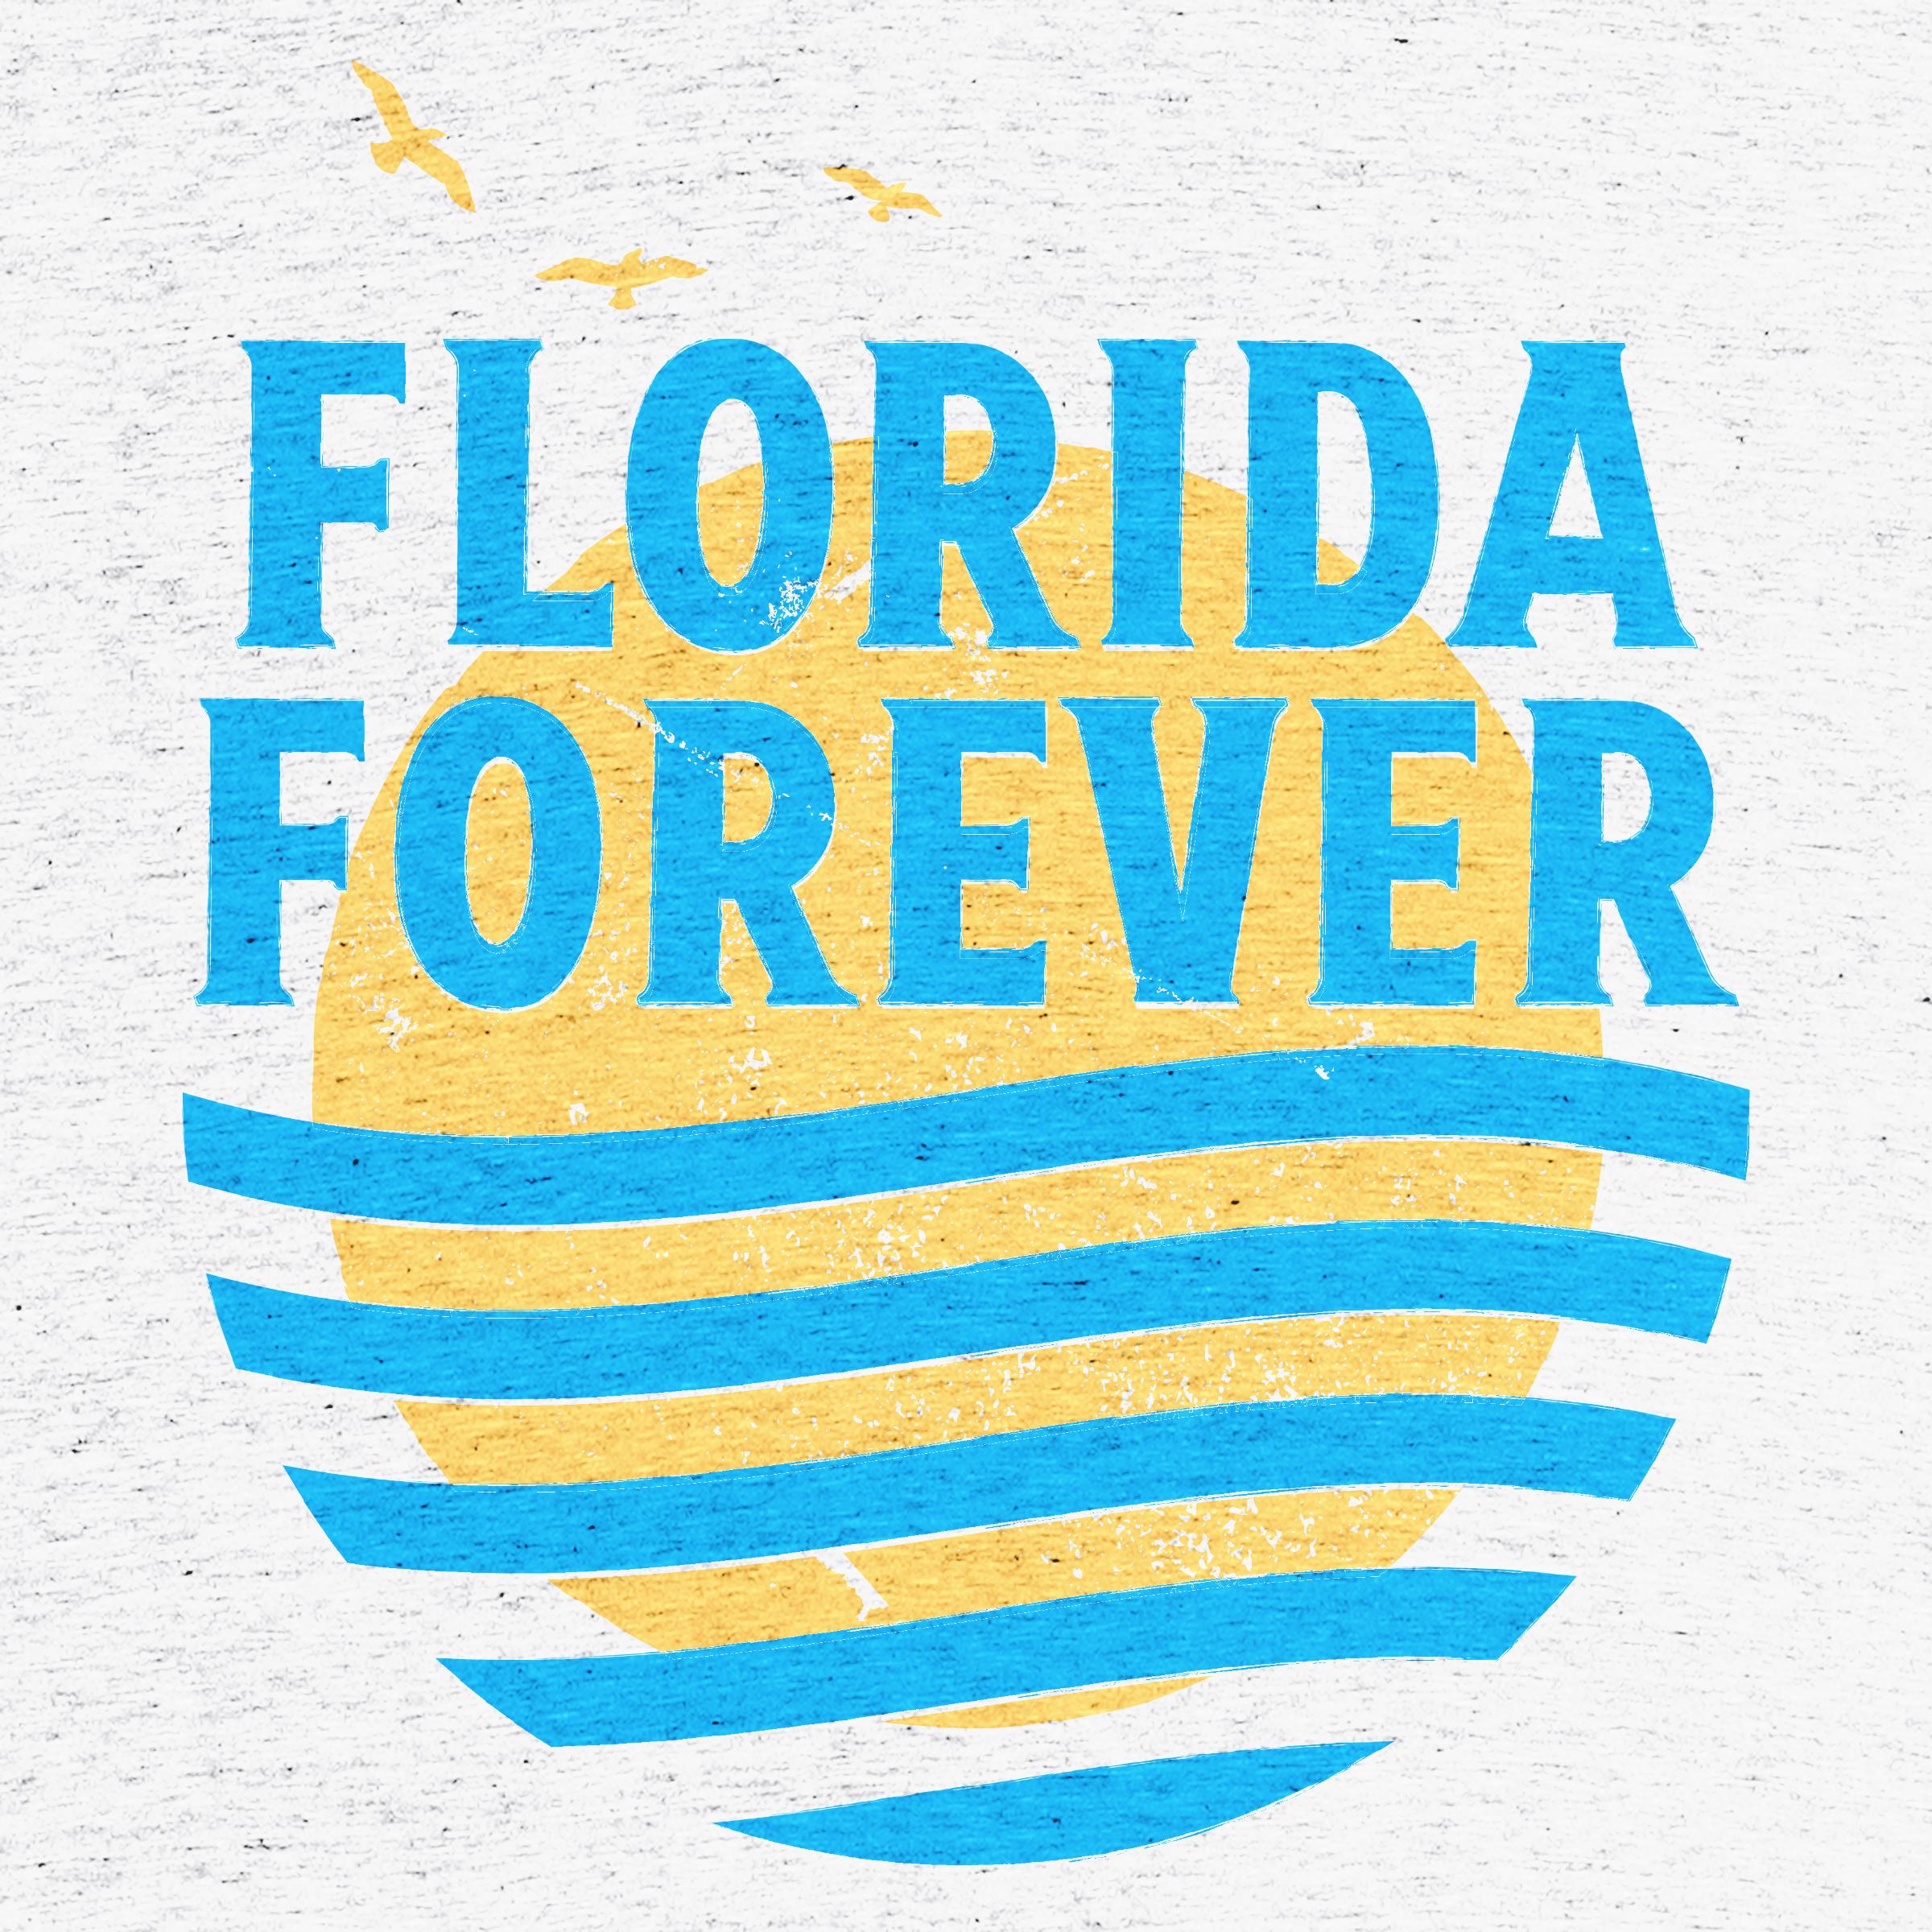 Florida Forever